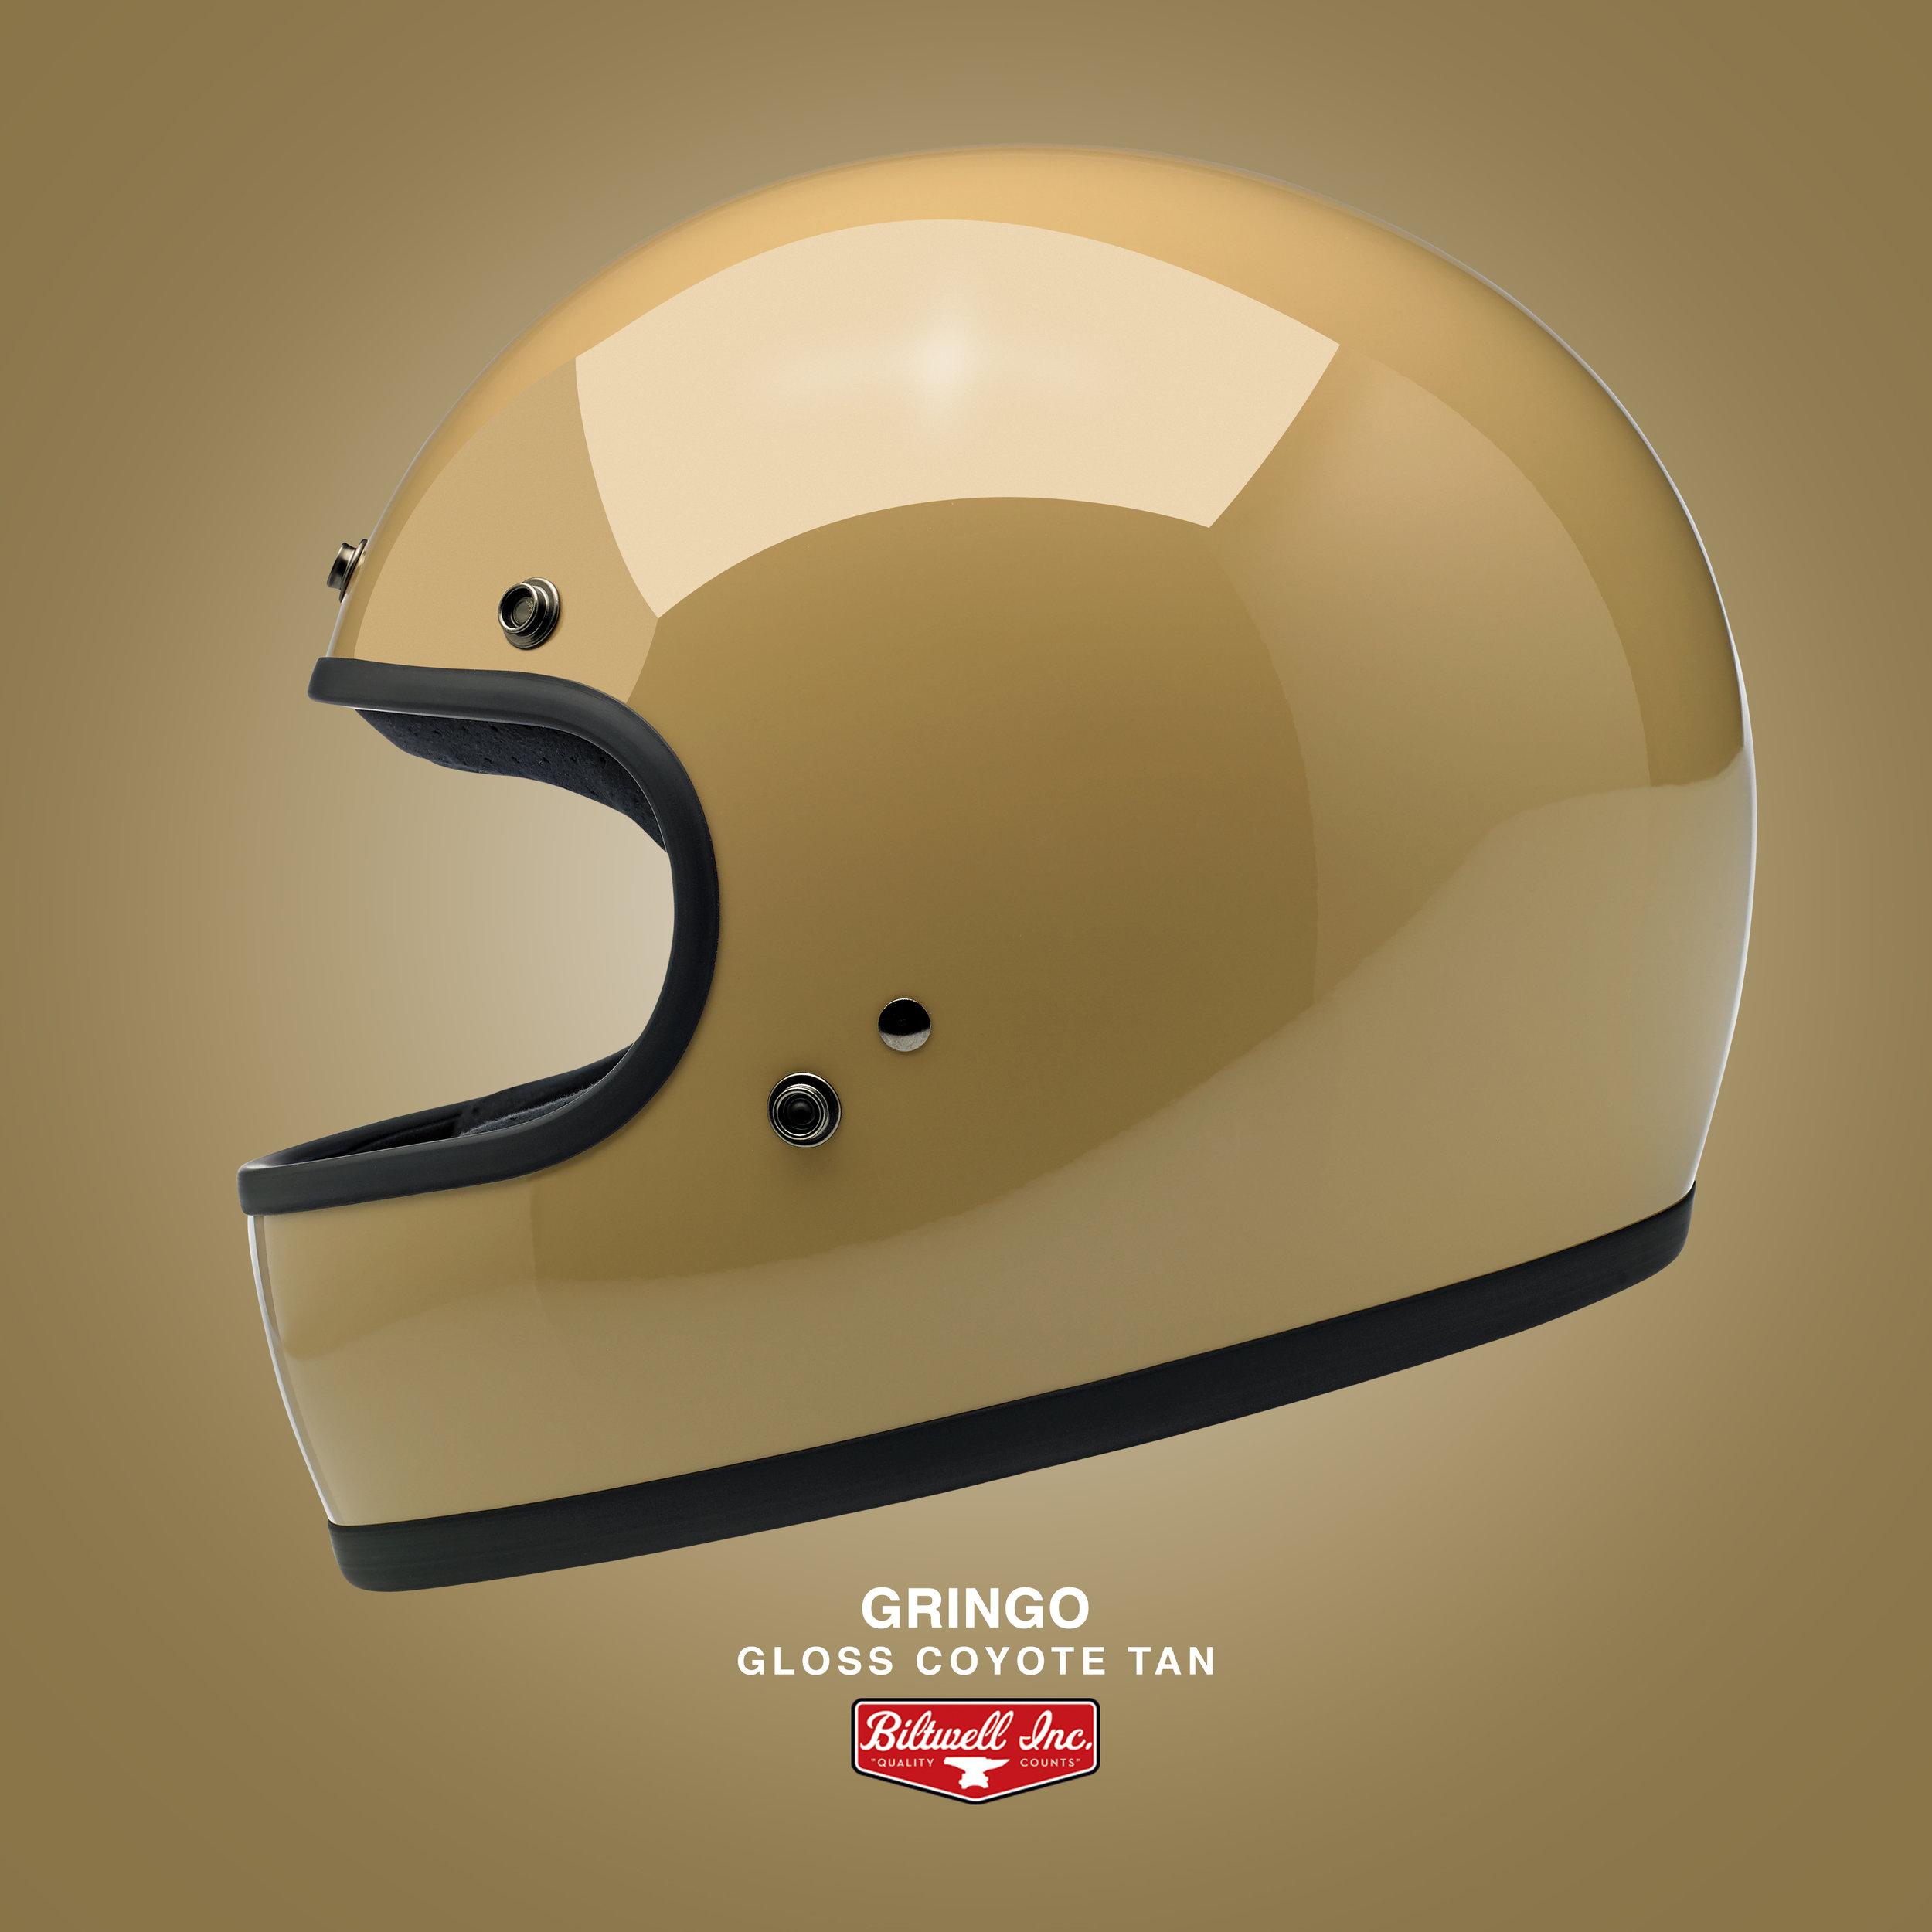 1002-114_Coyote Tan Gringo Helmet Panel.jpg